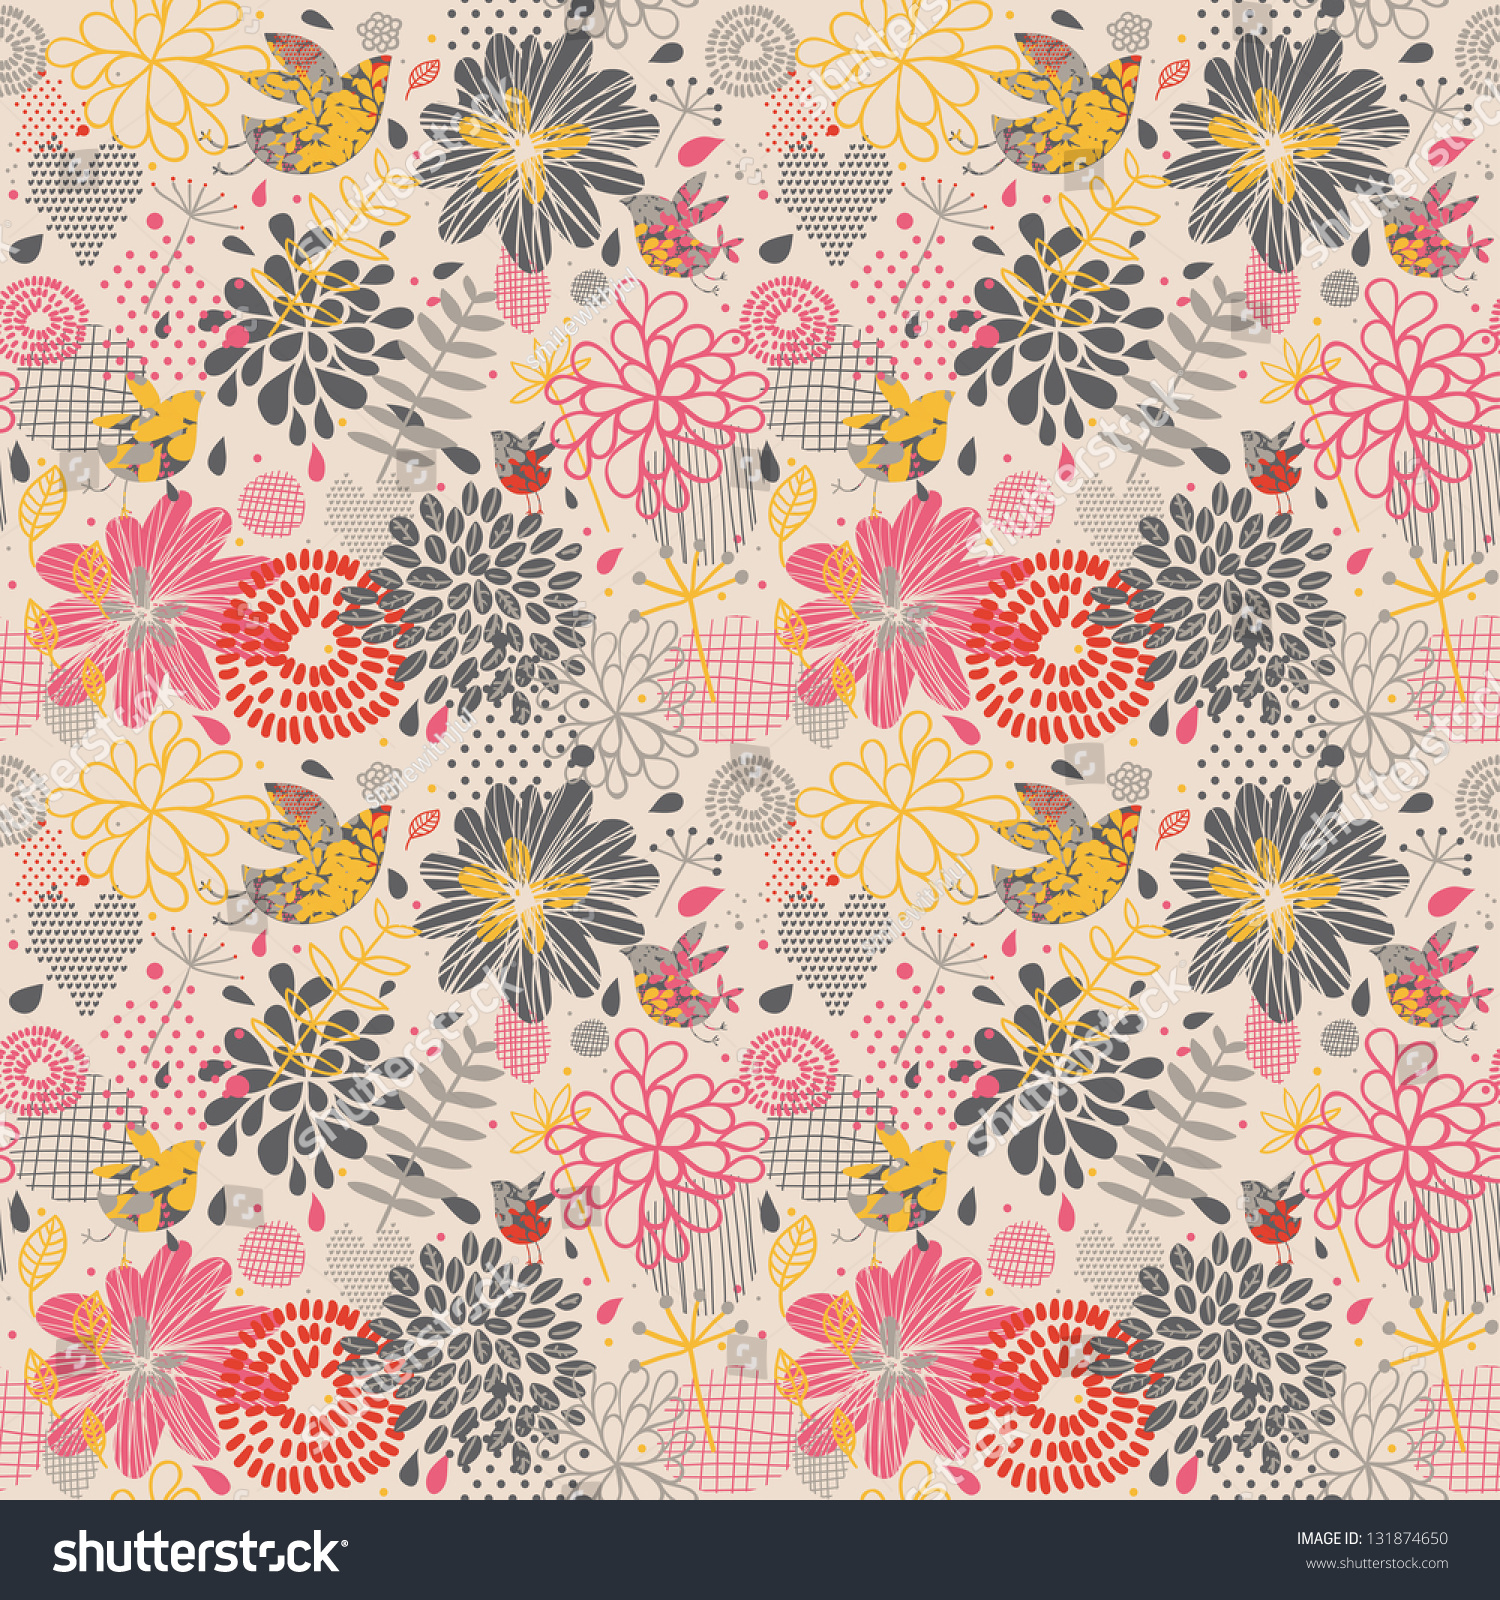 Colorful vintage background patterns - photo#23